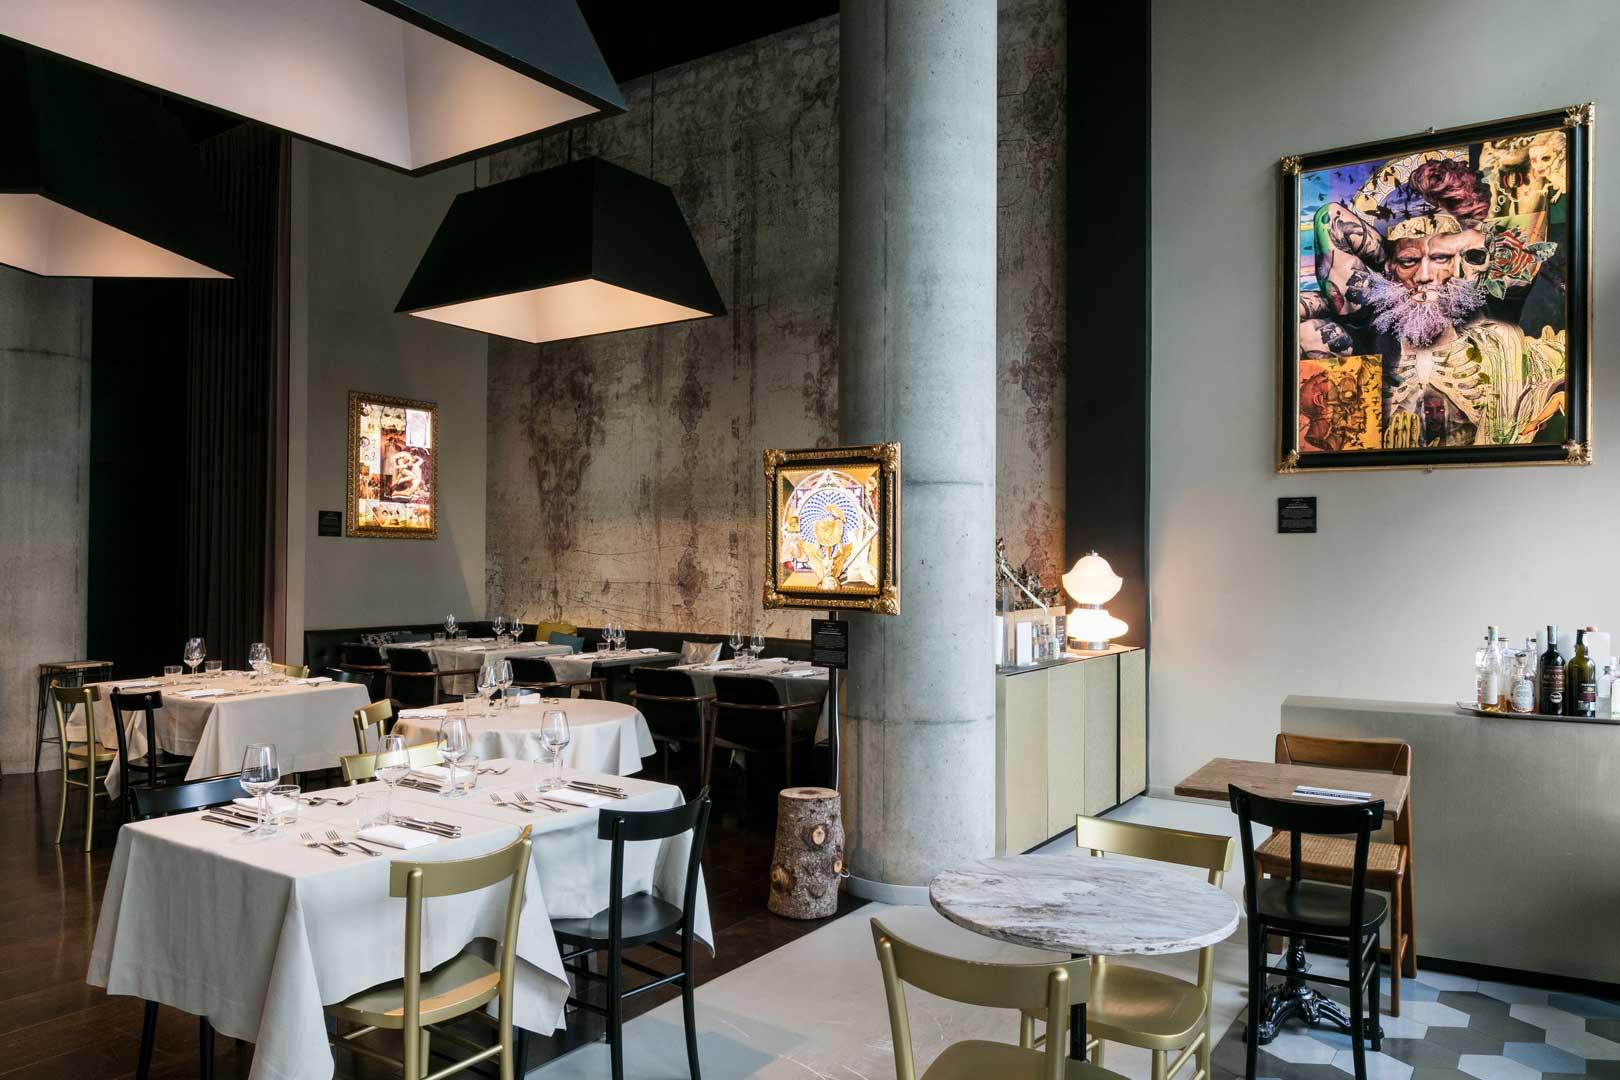 Il Santa - Bistrò Moderno | Milano